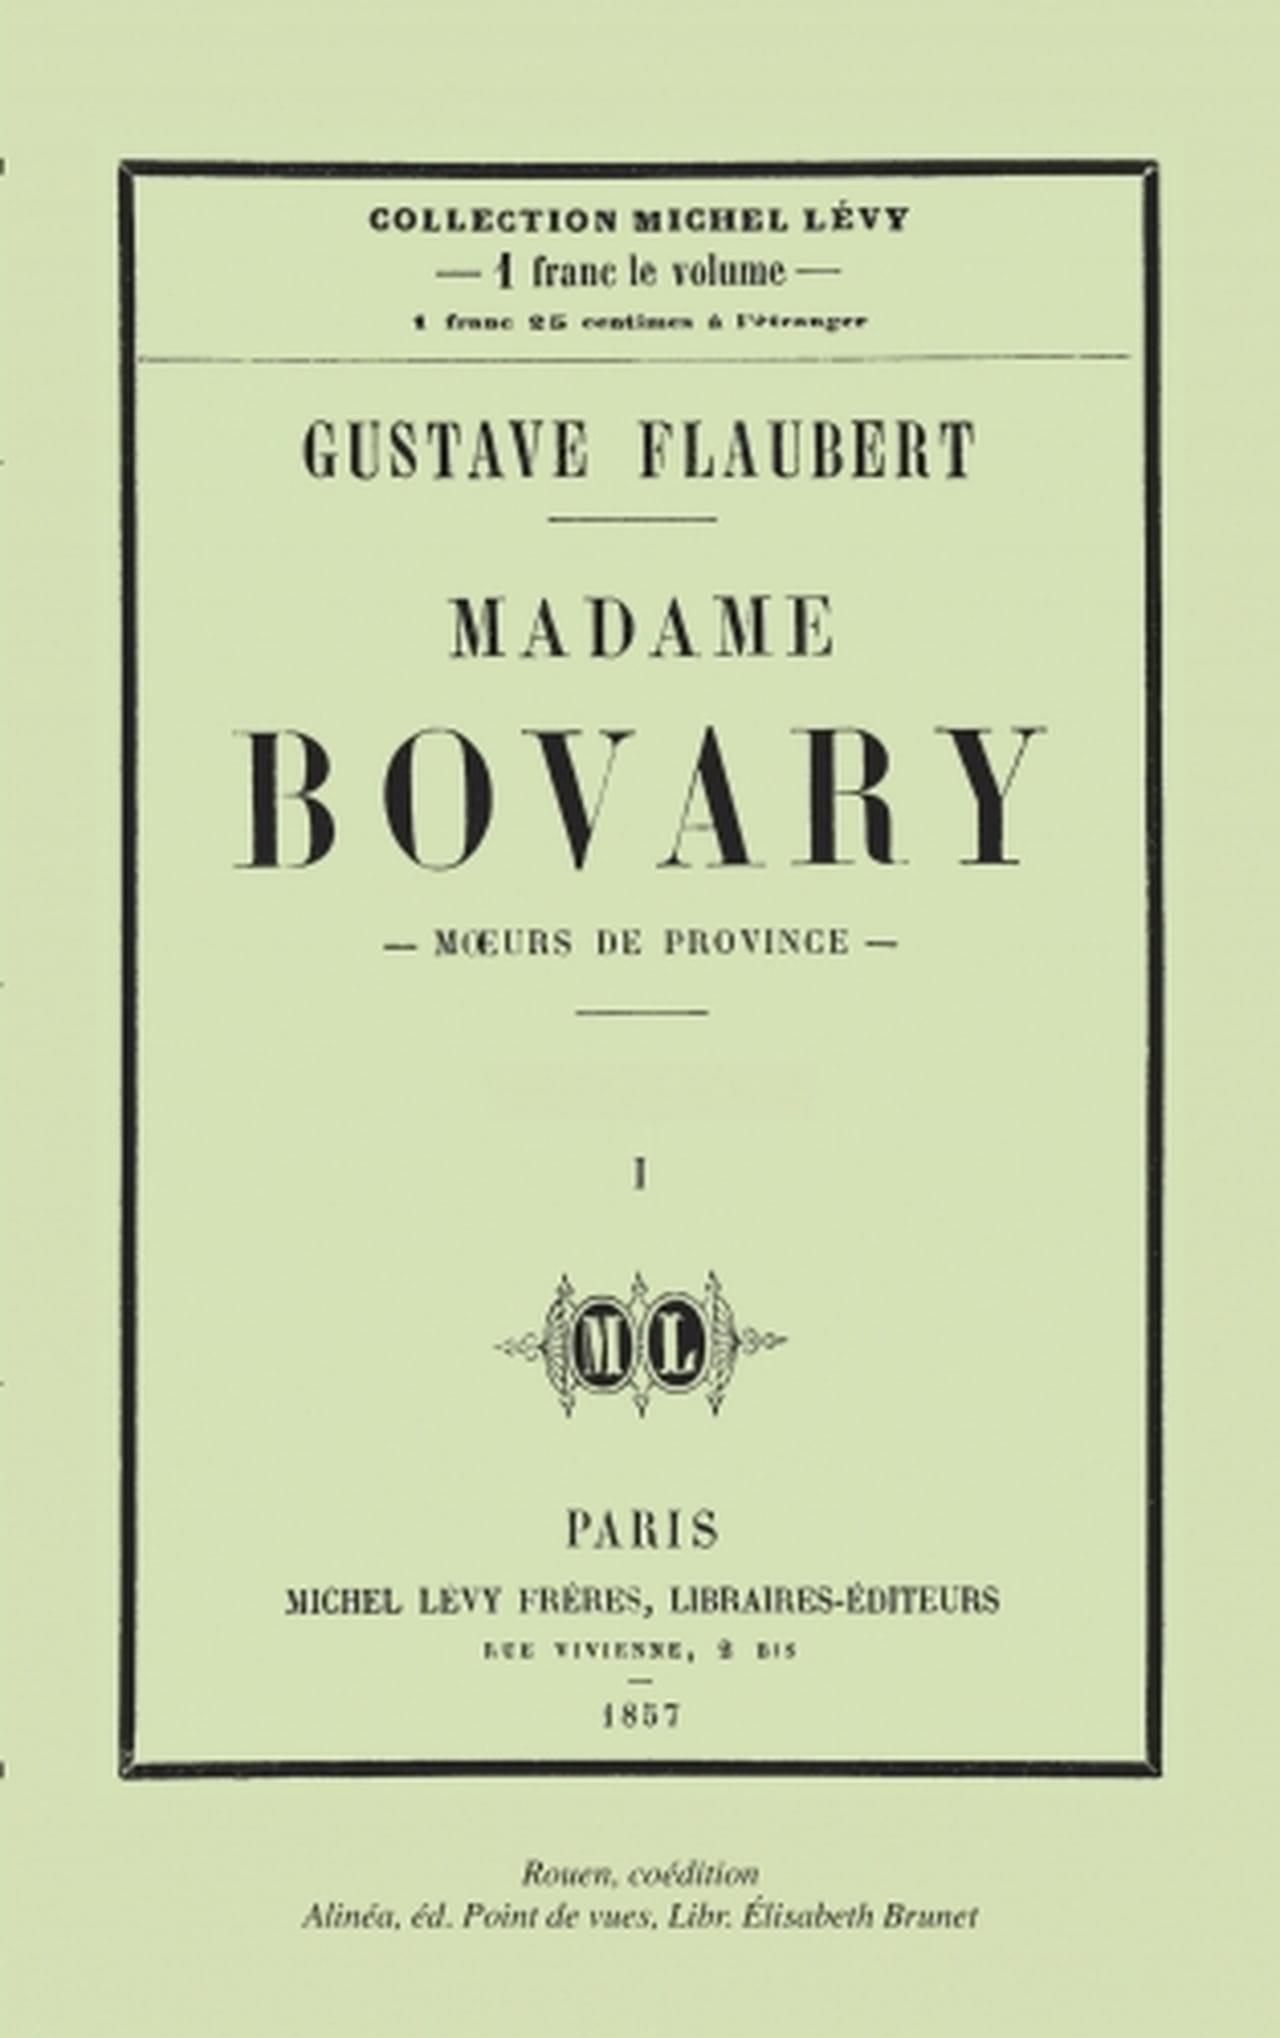 GUSTAVE FLAUBERT MADAME BOVARY ~ 1948